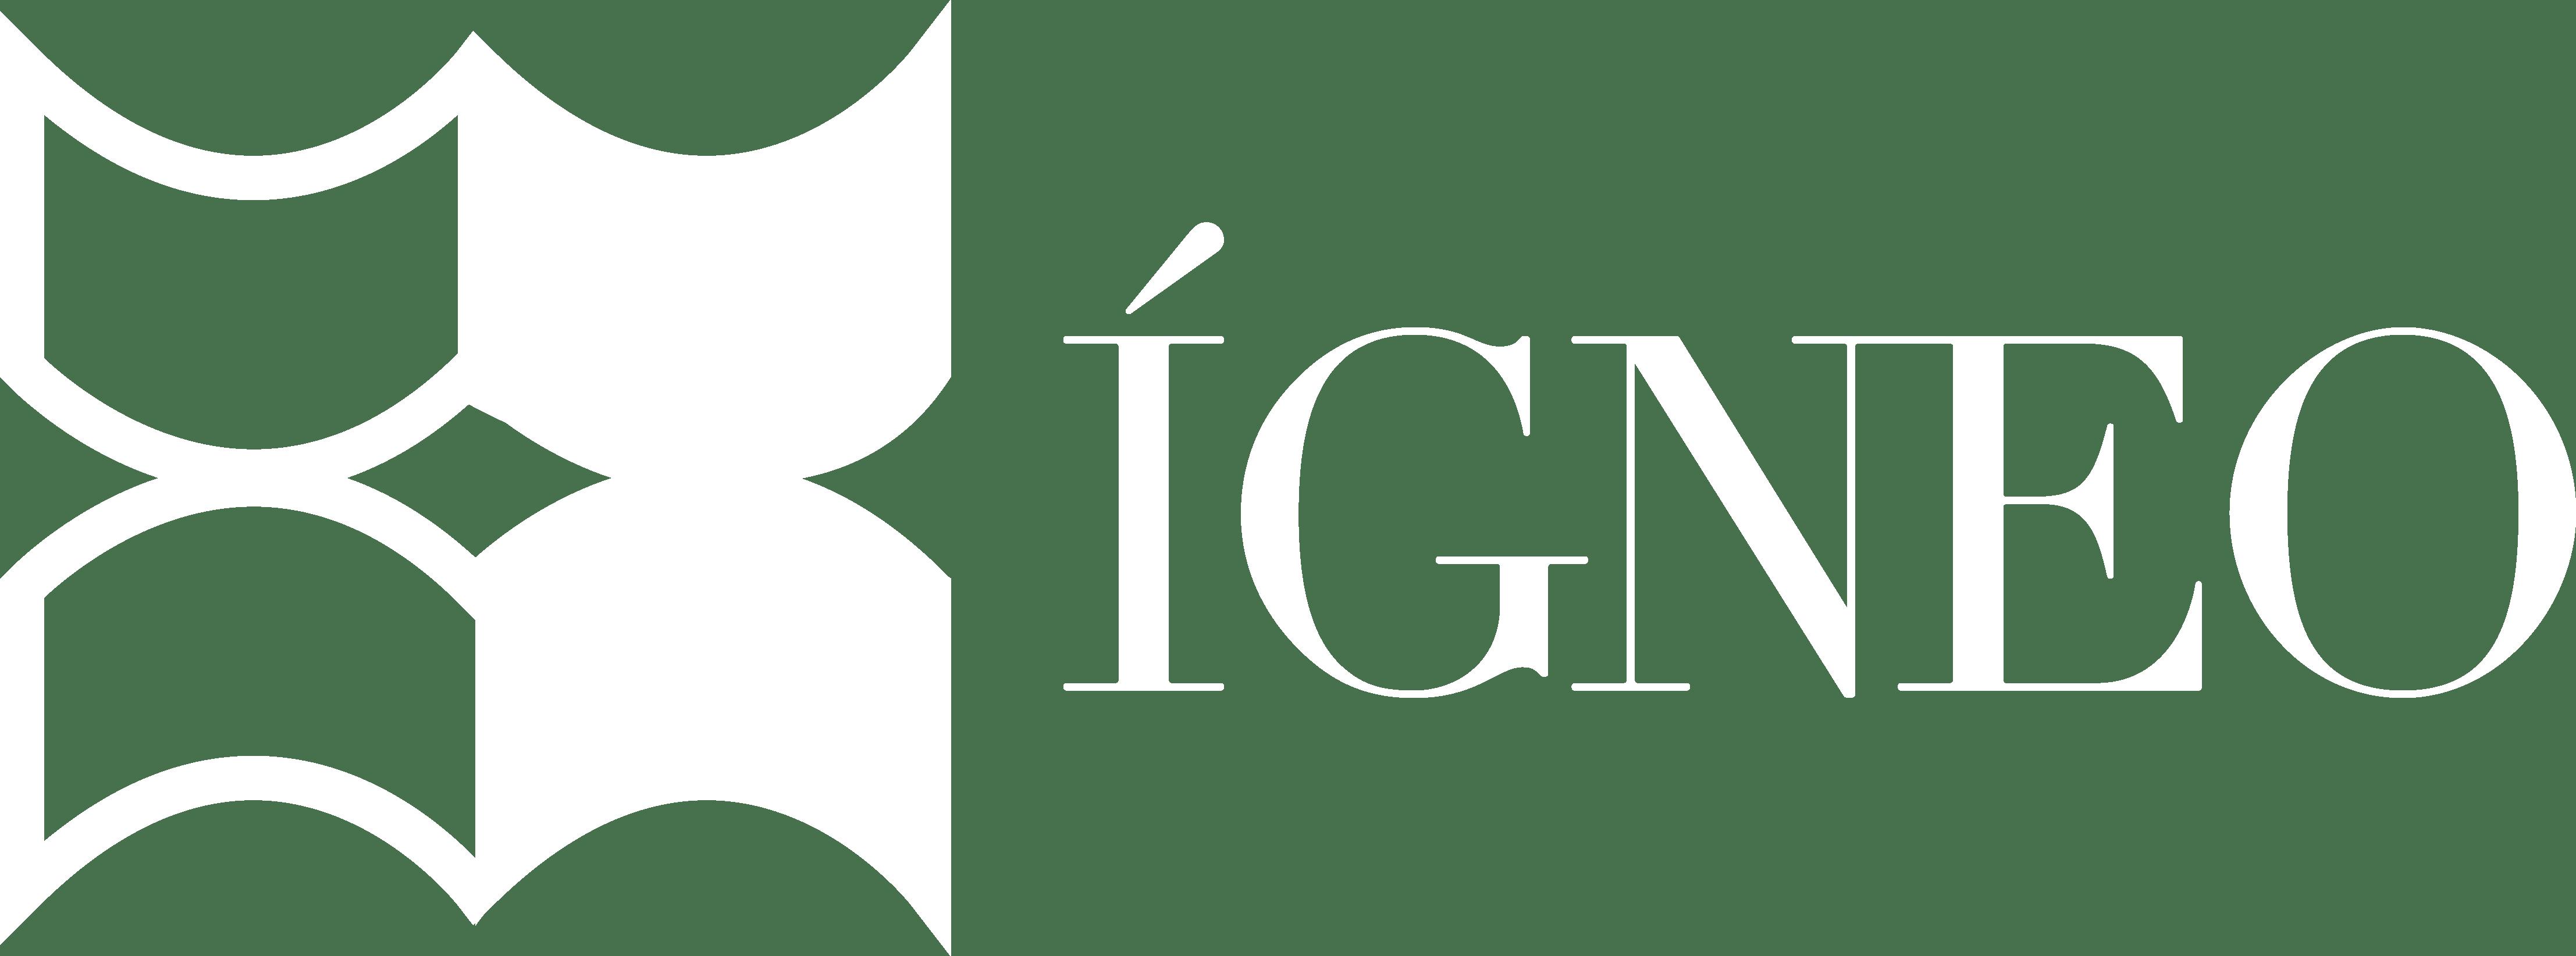 Grupo Ígneo | Editorial Ígneo